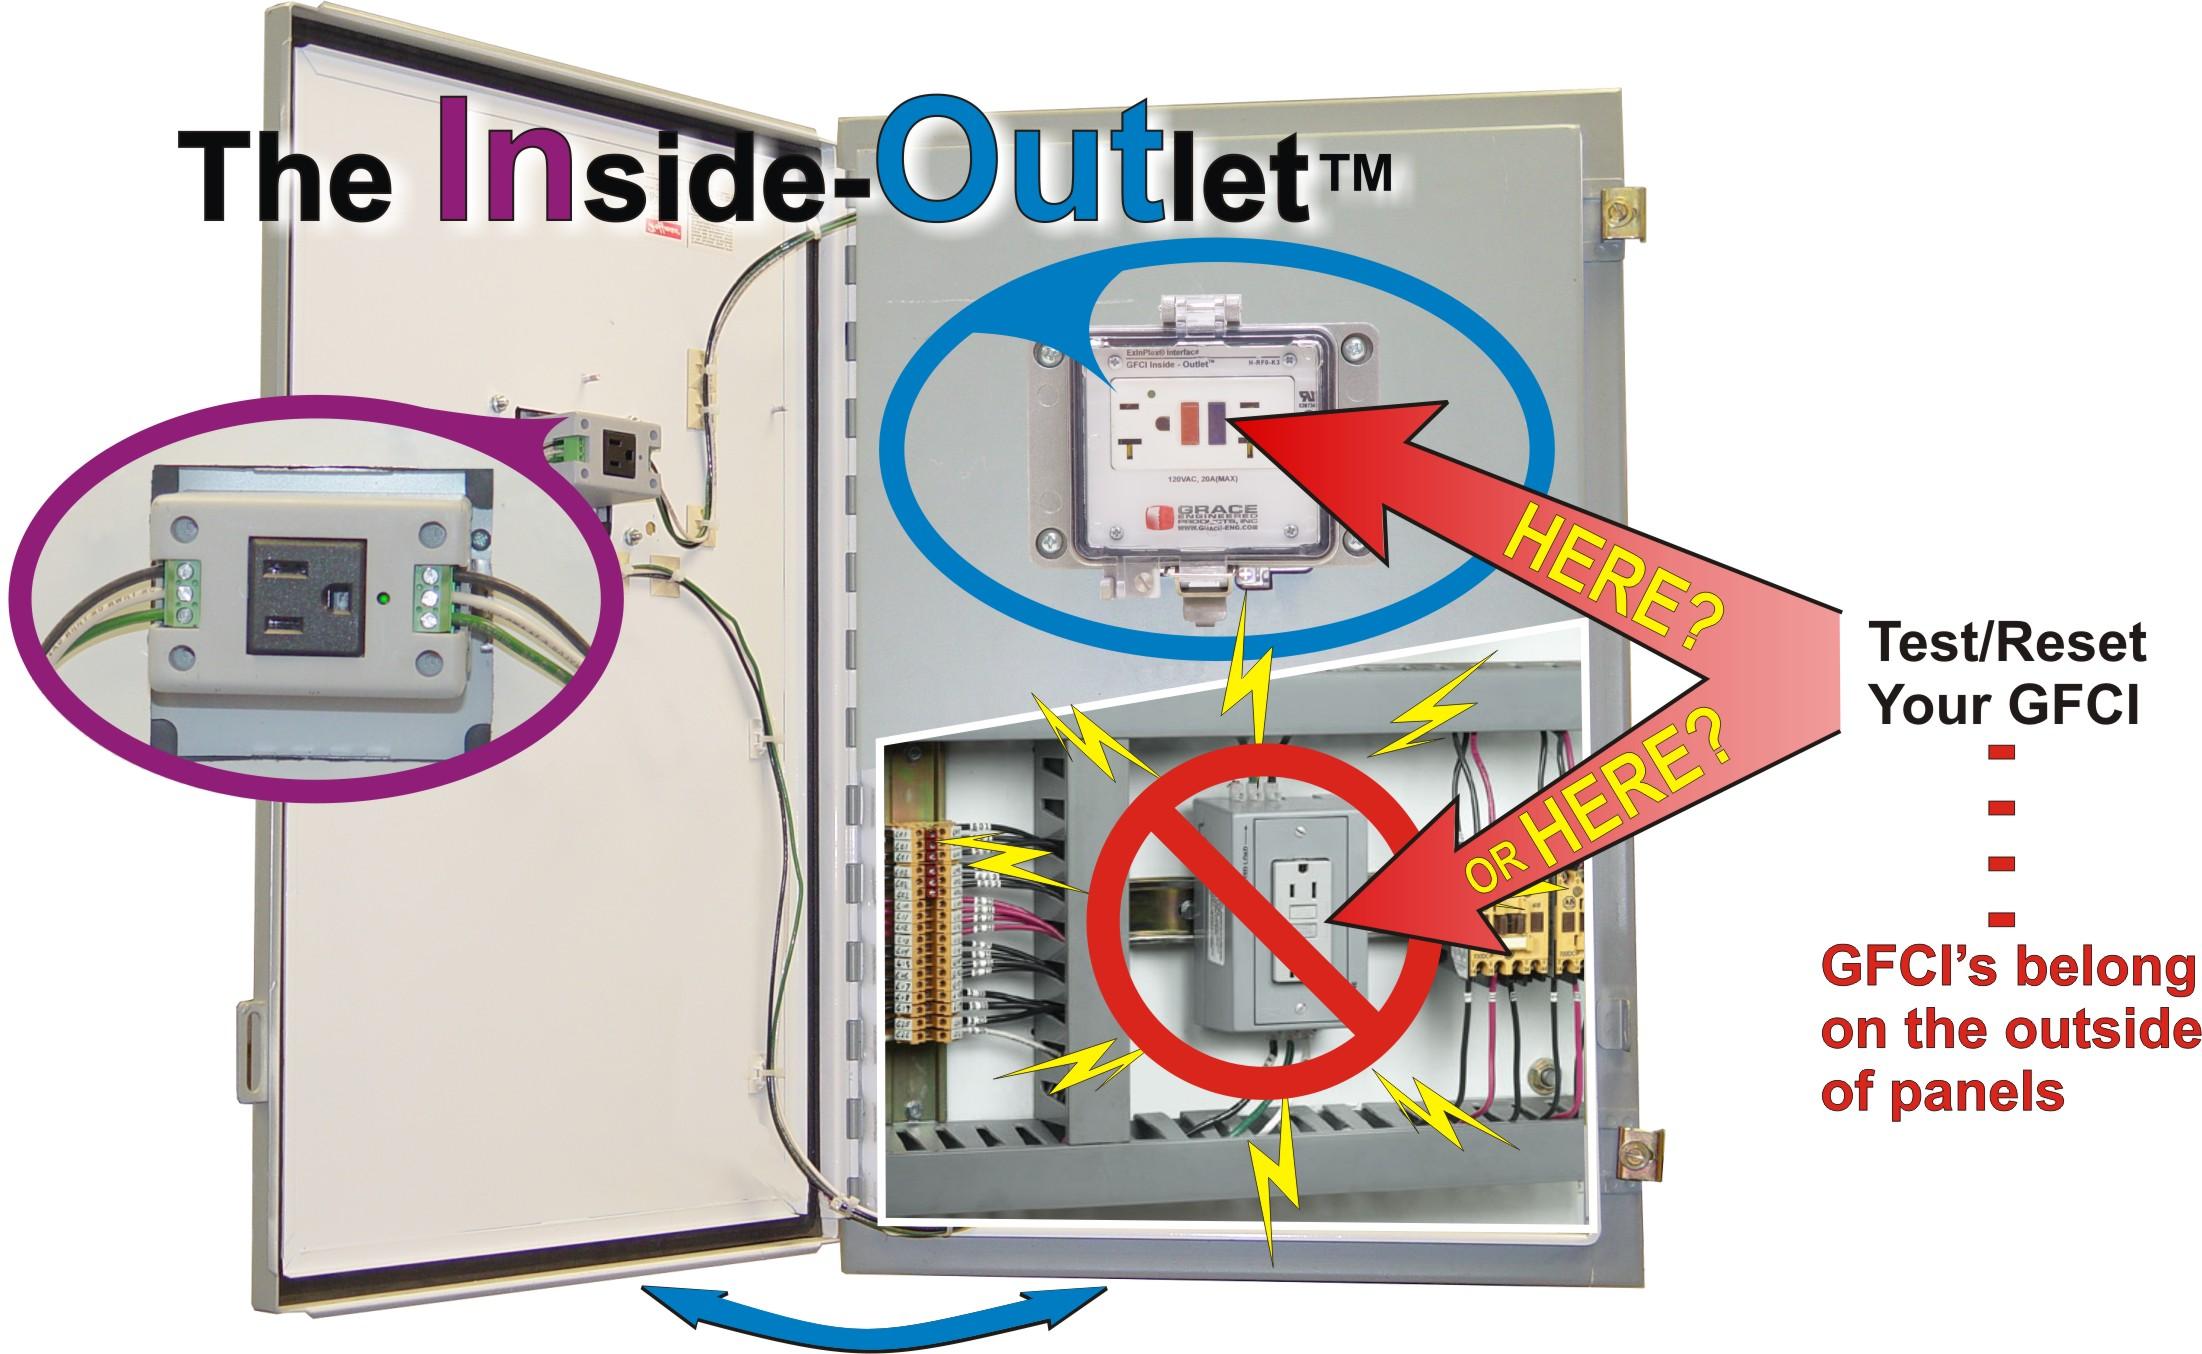 GFCI-Inside-Outlet